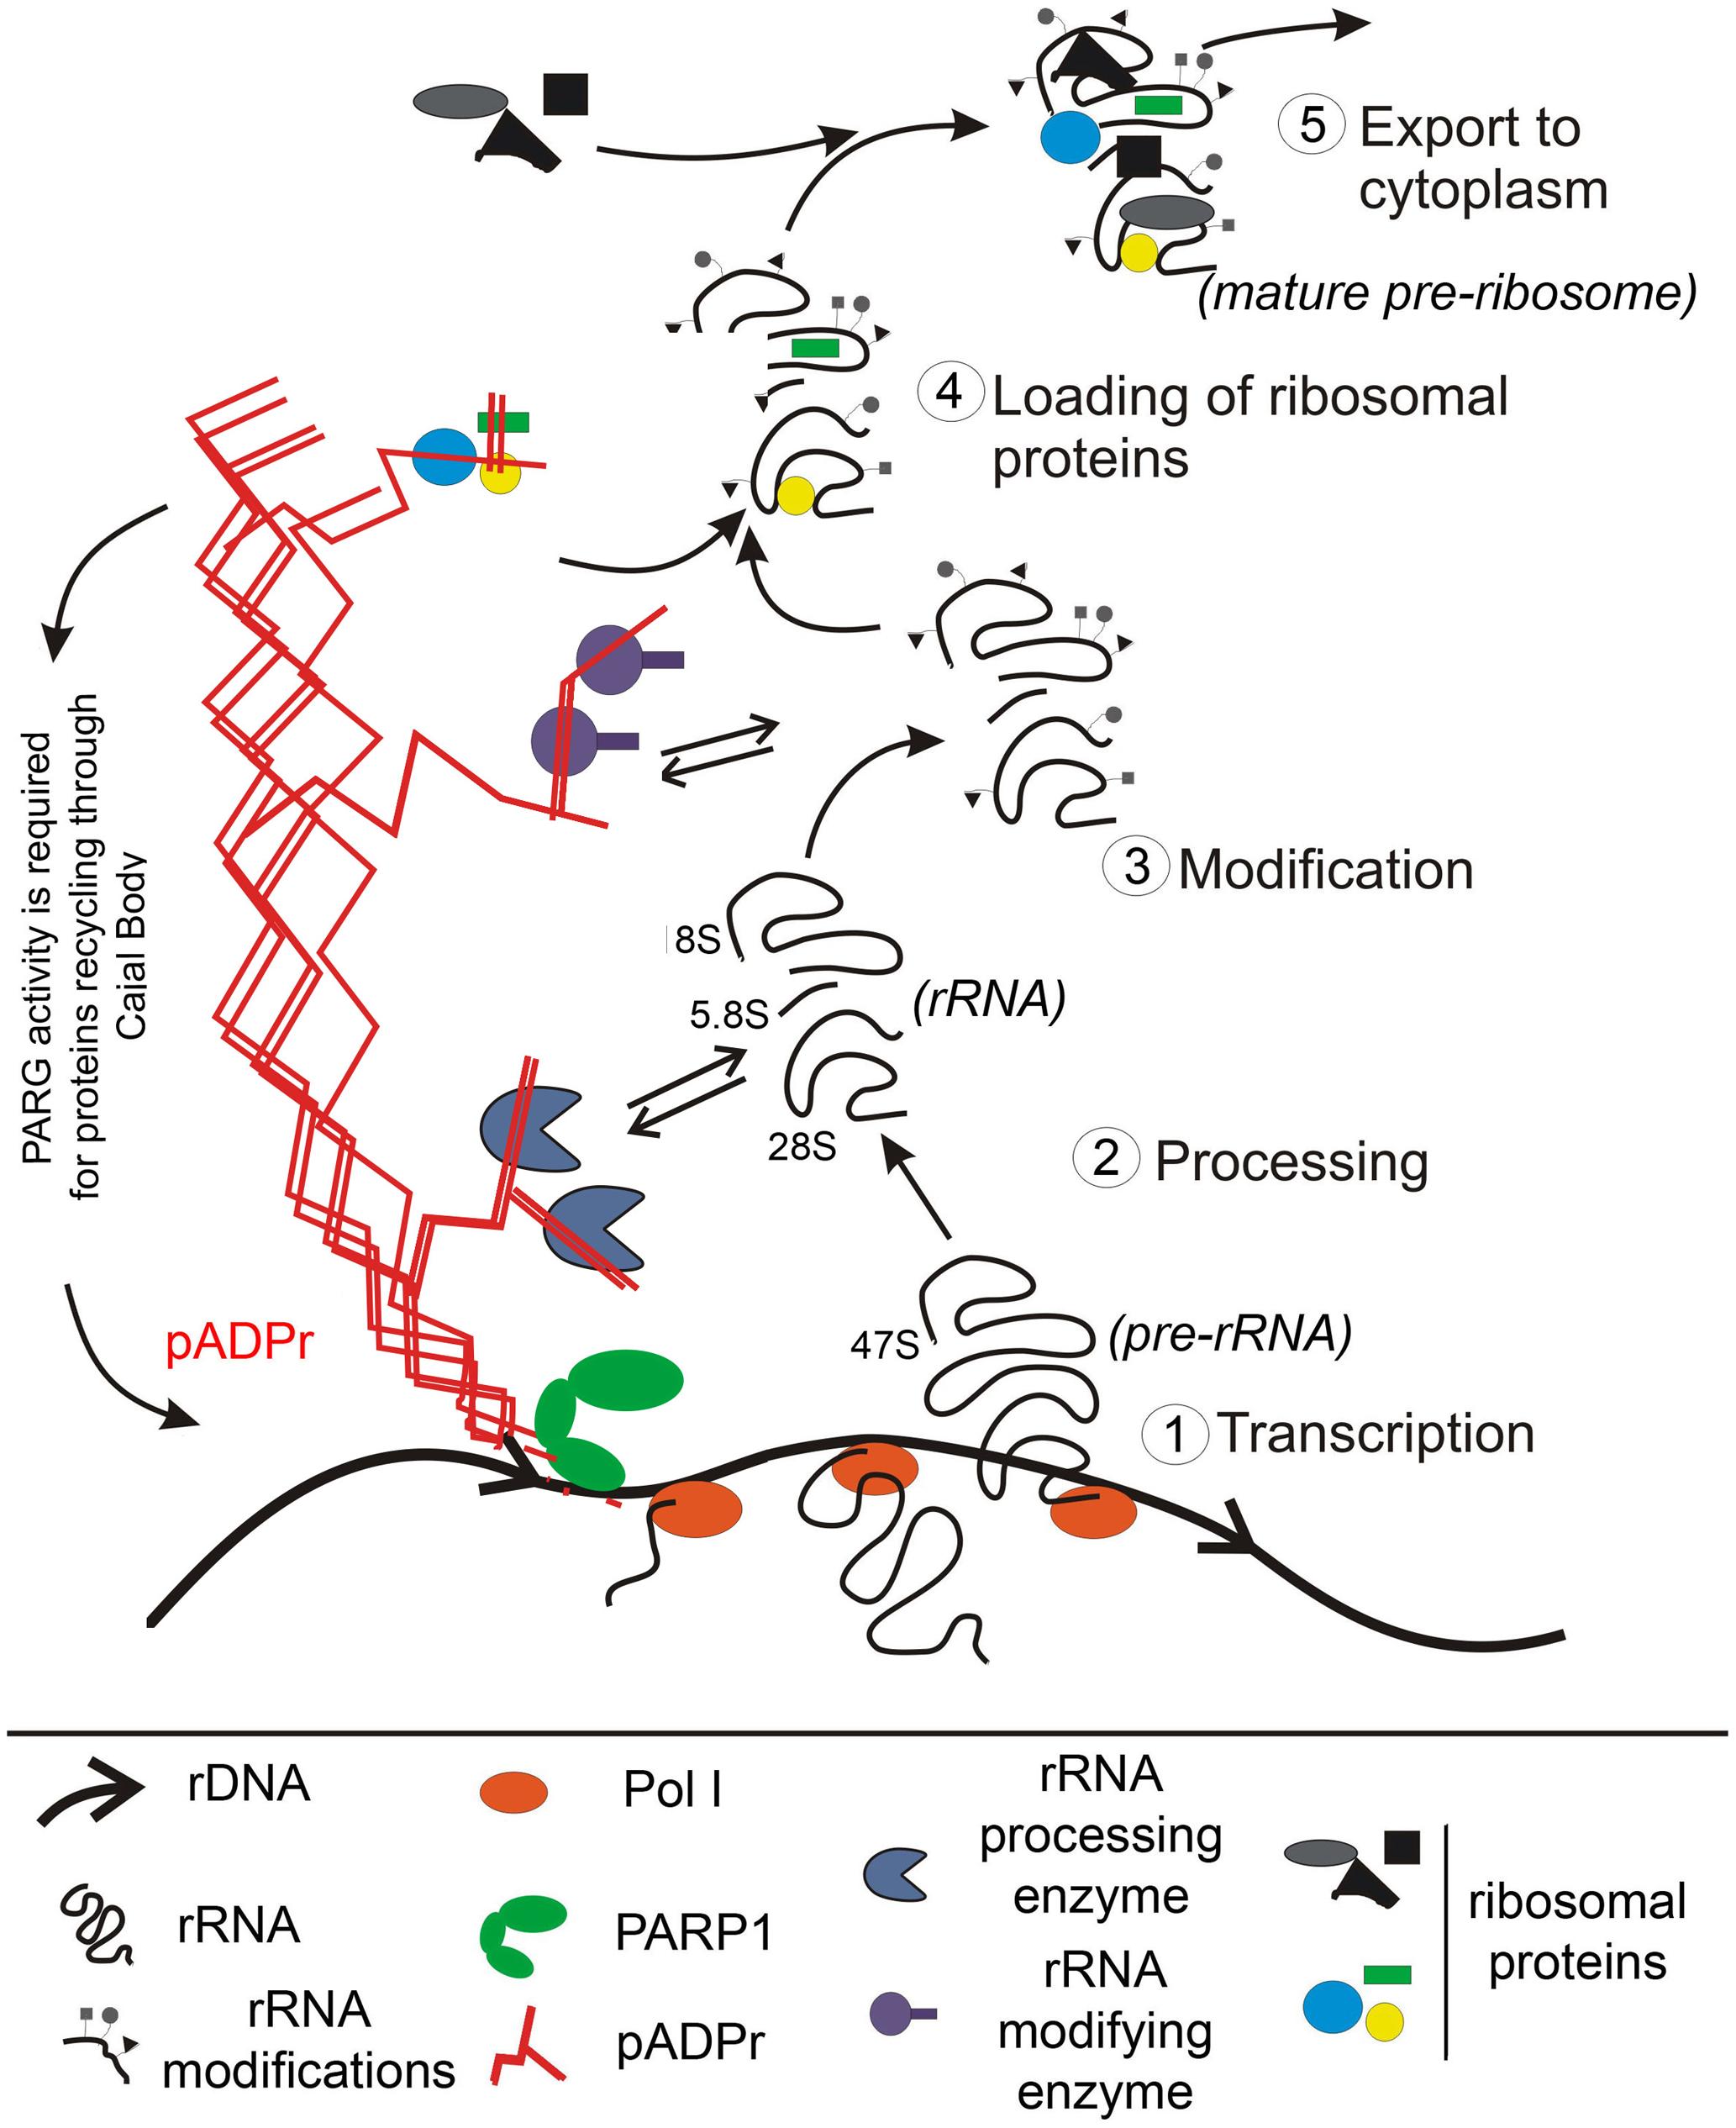 Nuclear PARP1 facilitates ribosomal biogenesis: a model.